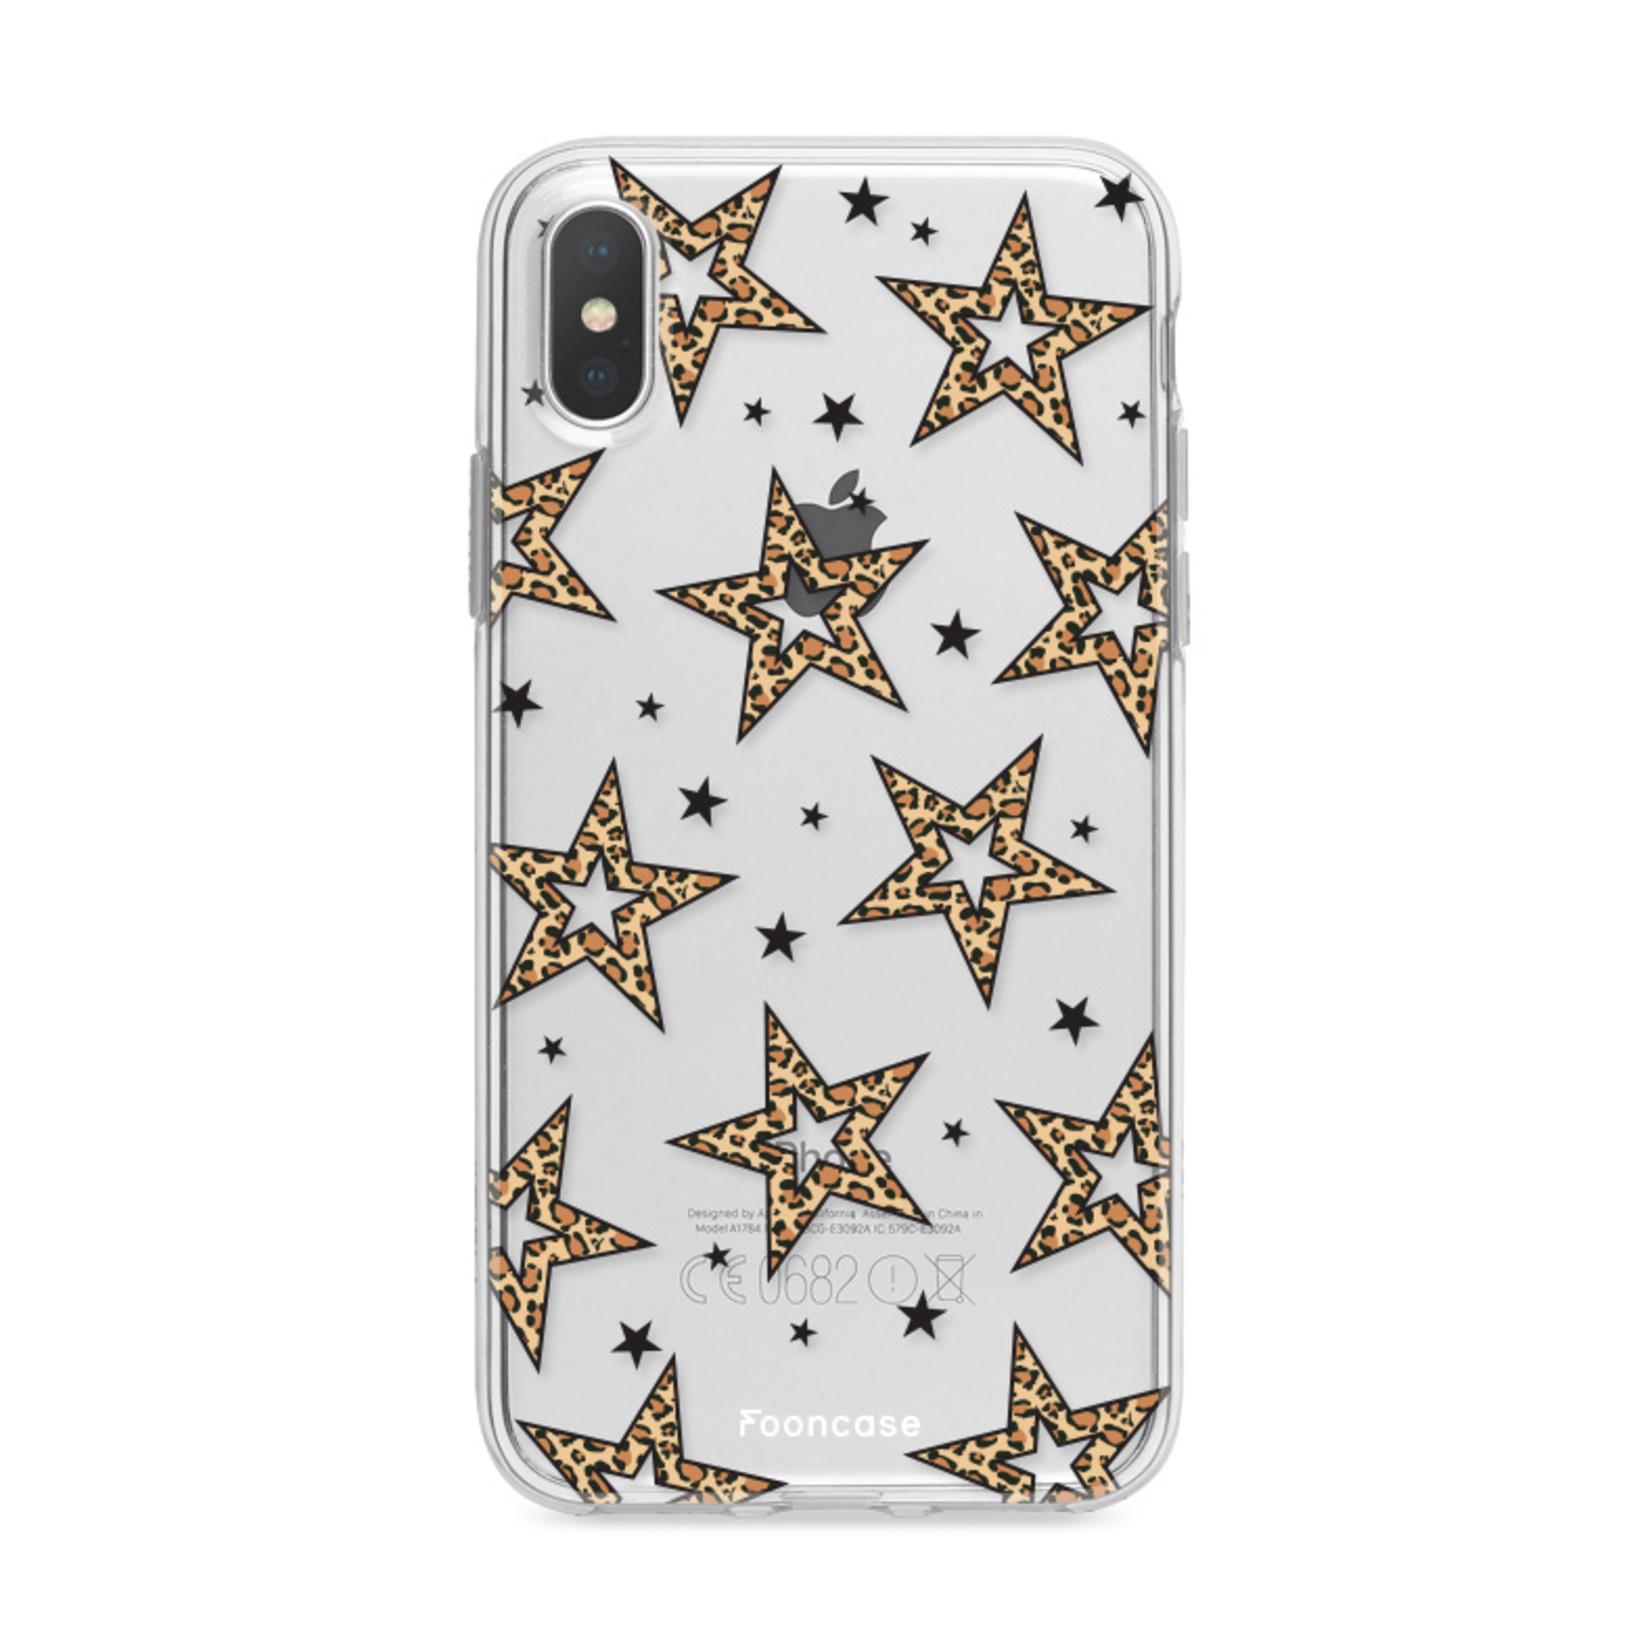 iPhone XS Max hoesje TPU Soft Case - Back Cover - Rebell Leopard Sterren Transparant